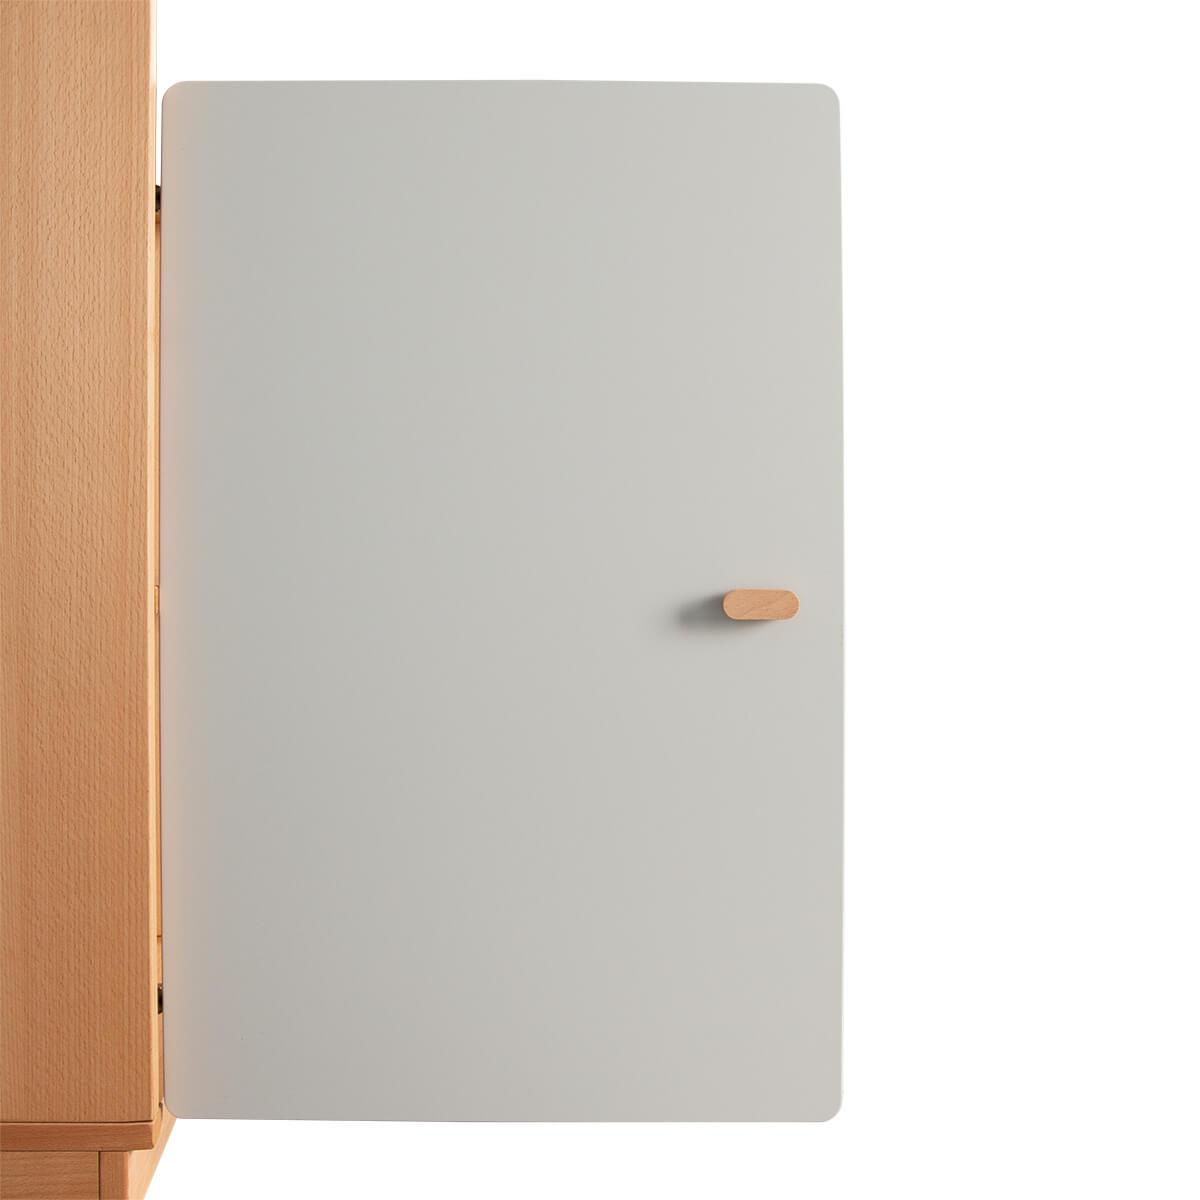 Schranktür 2/5 70cm-Griff DESTYLE Debreuyn  MDF grau-lackiert